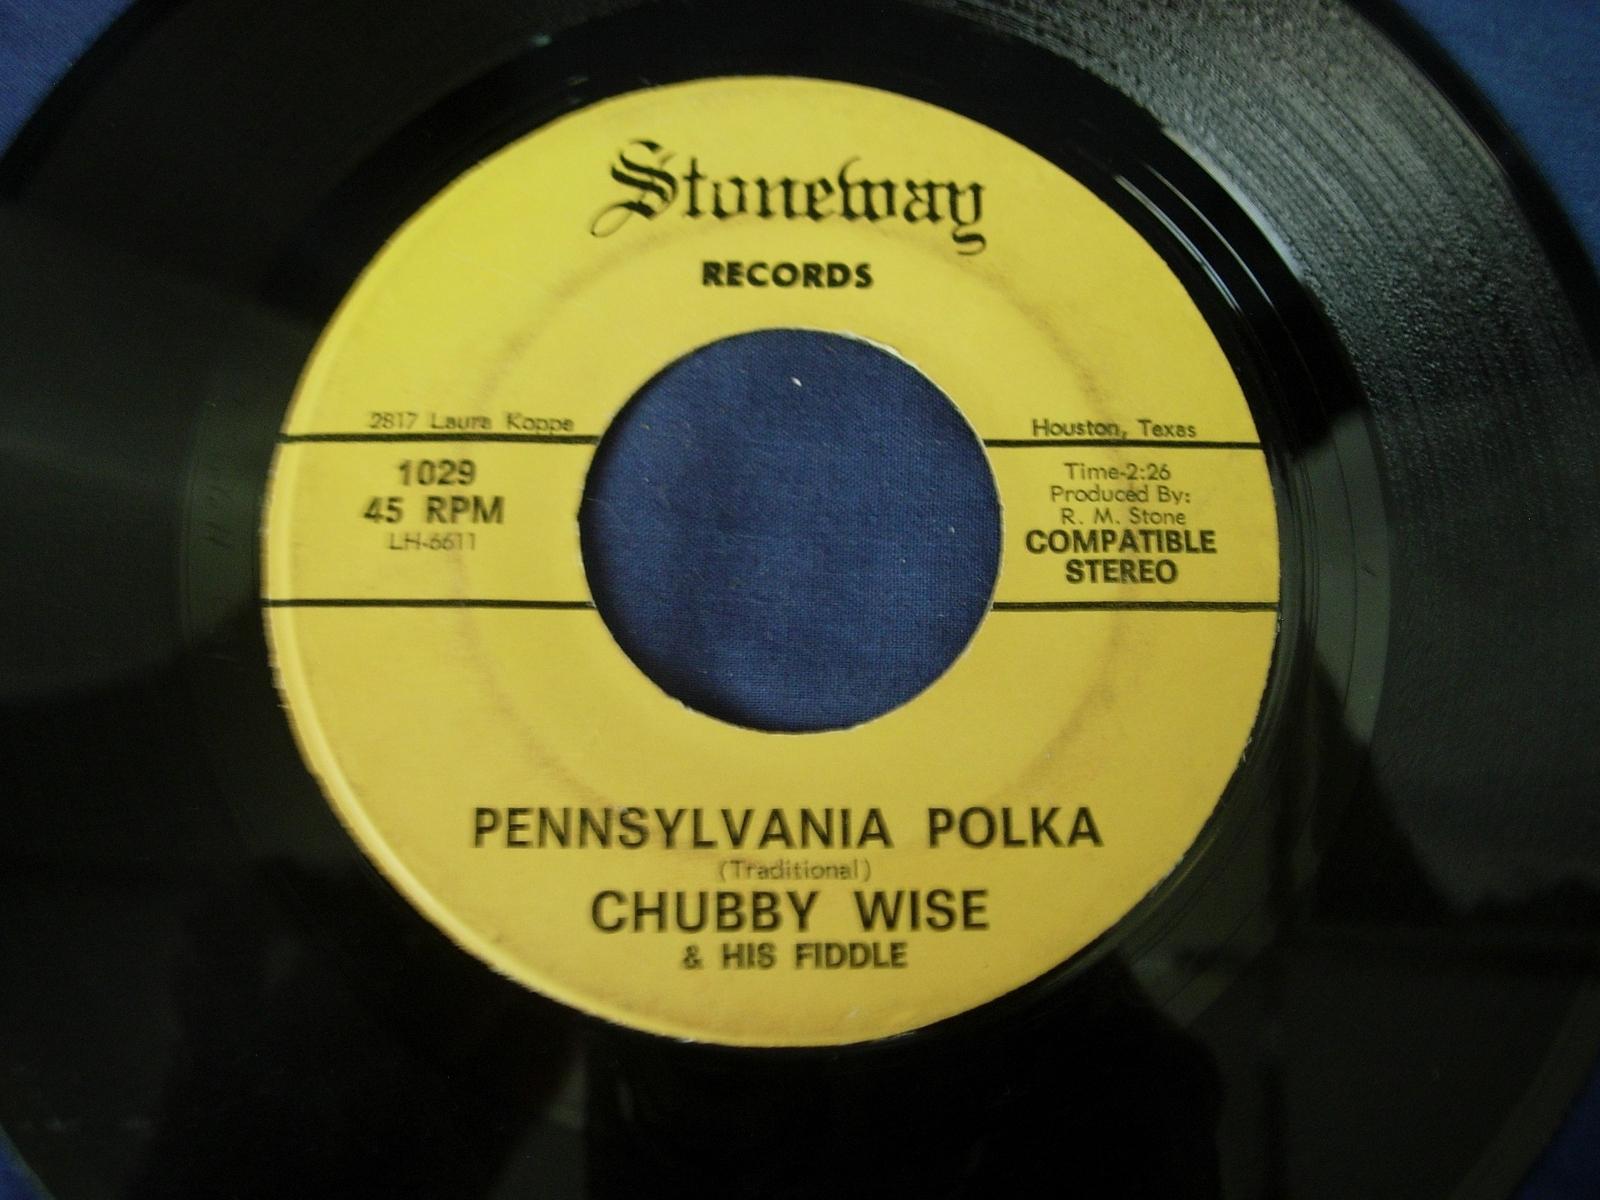 Chubby Wise - Houston Schottische / Pennsylvania Polka - Stoneway Records 1029